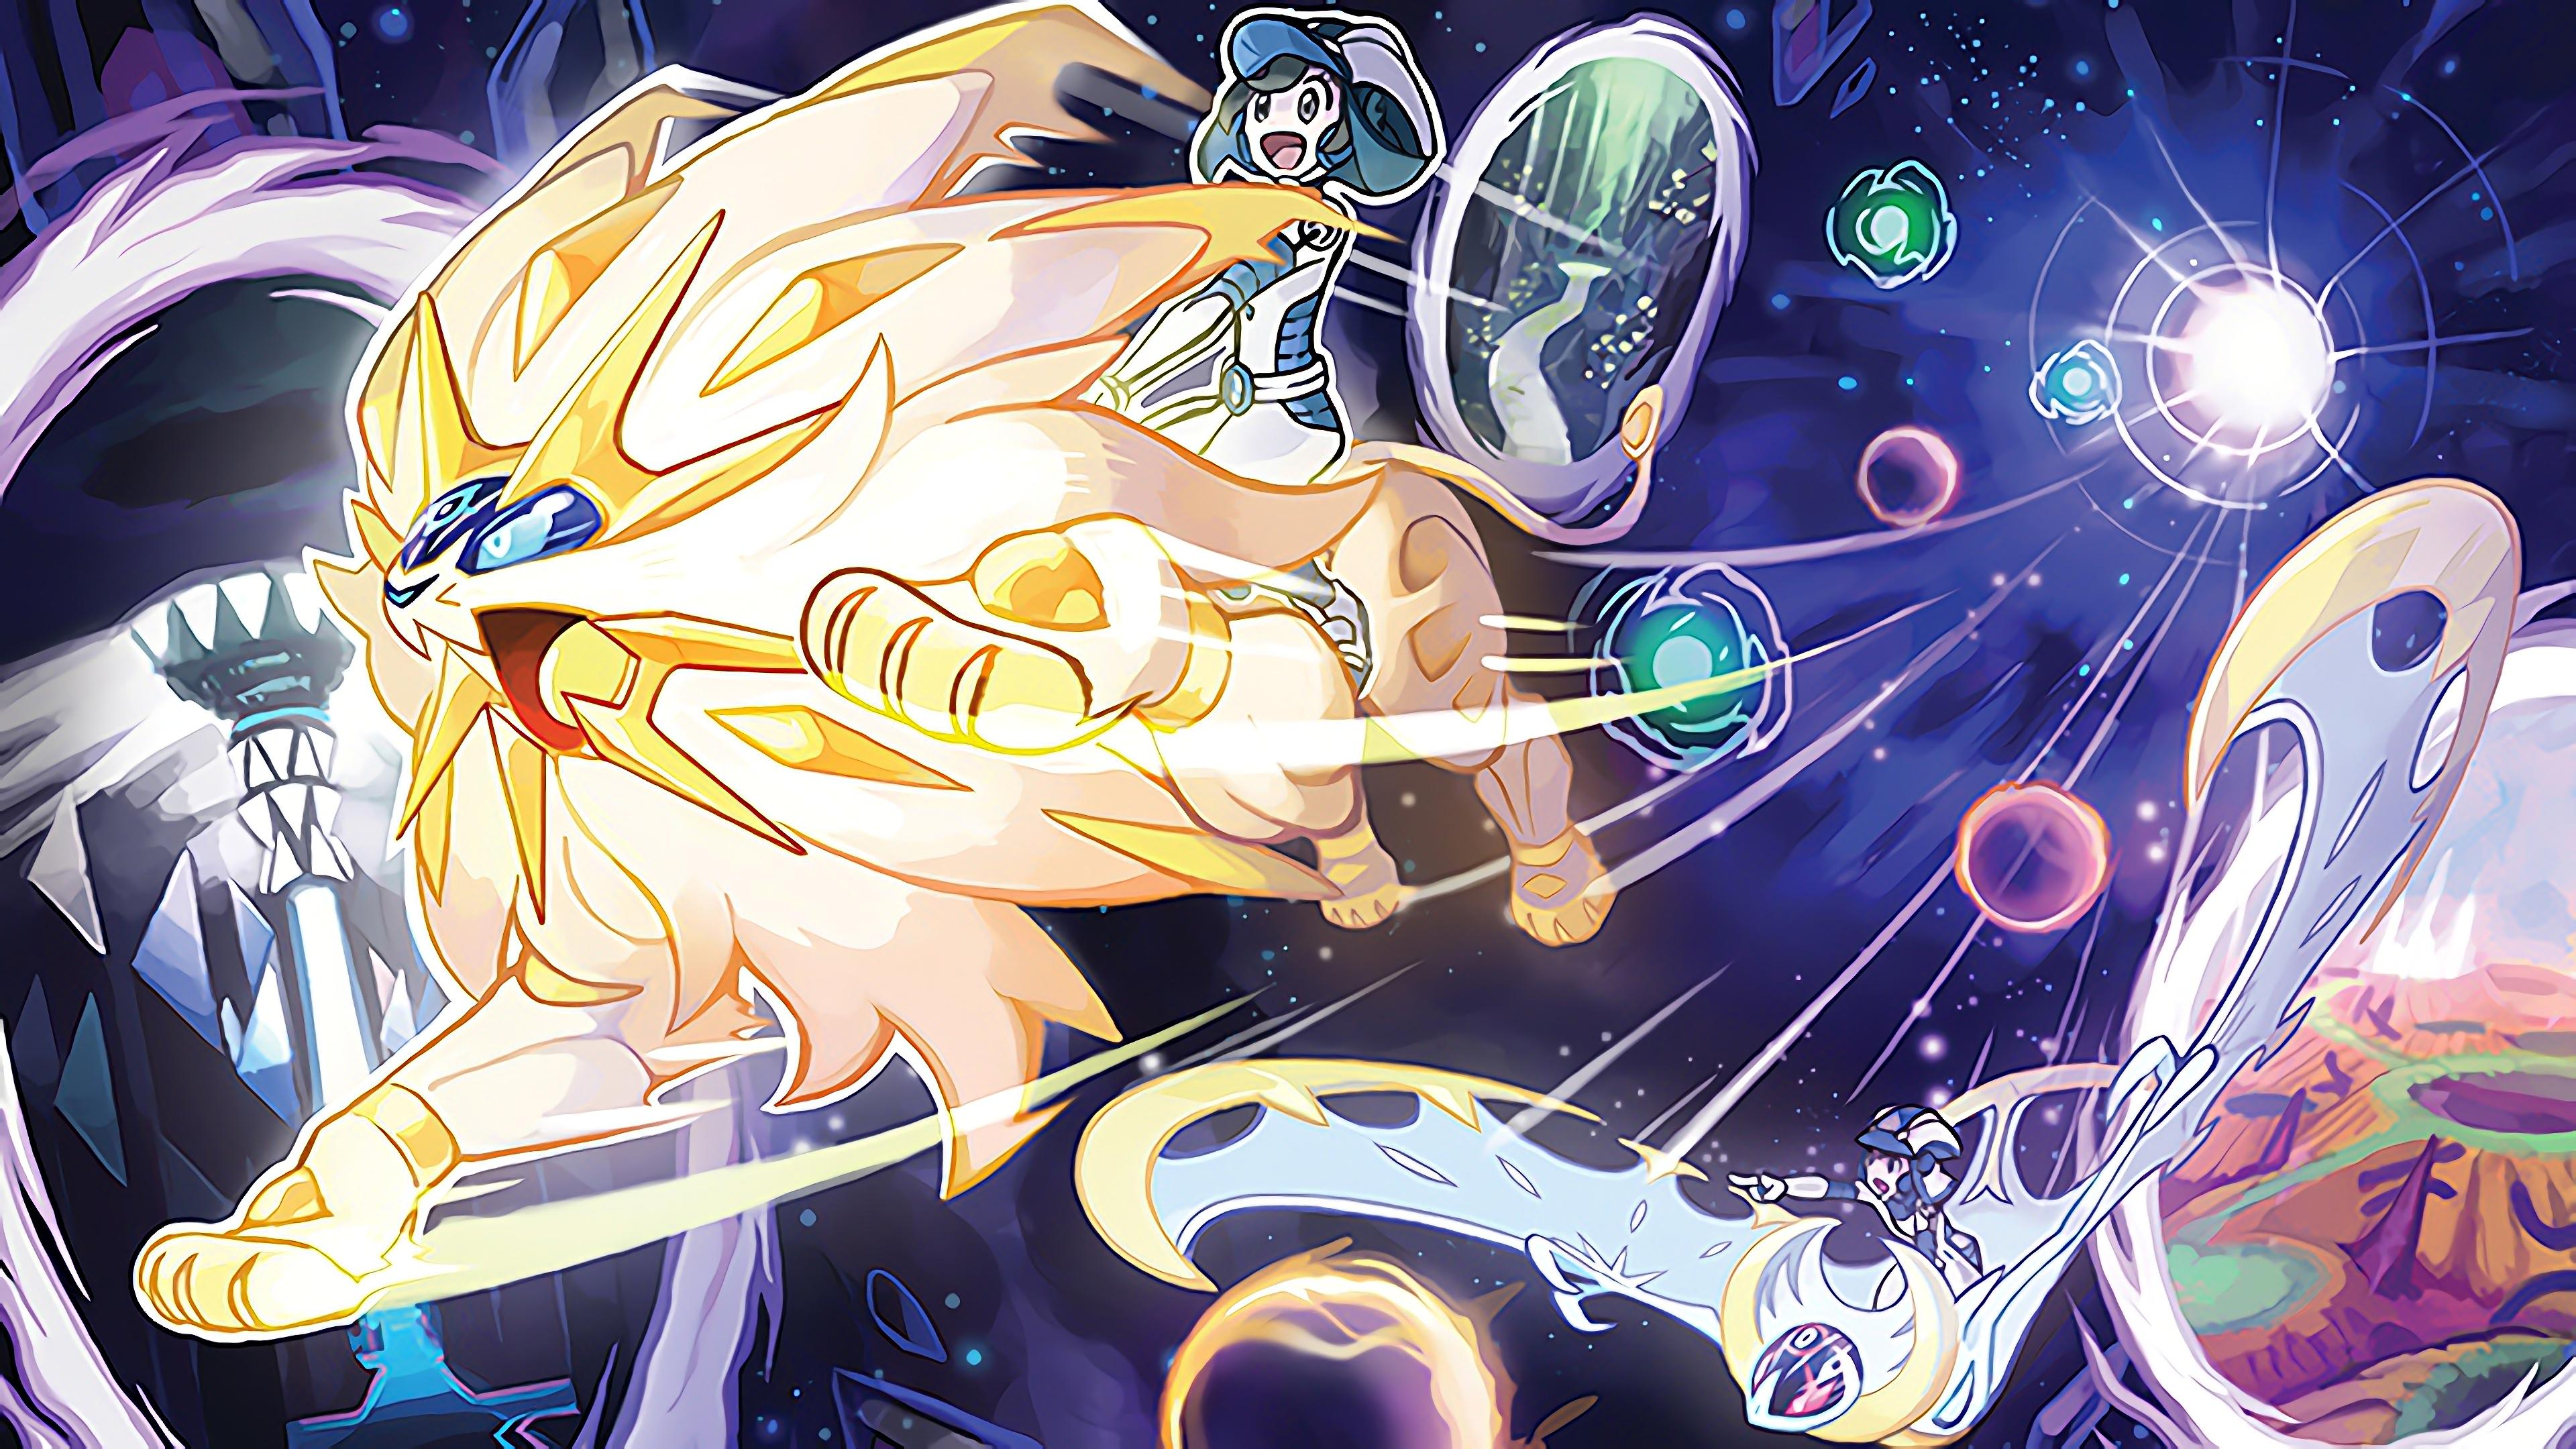 Pokemon Ultra Sun And Moon Xbox 360 Wallpaper - Pokemon Ultra Sun And Ultra Moon , HD Wallpaper & Backgrounds